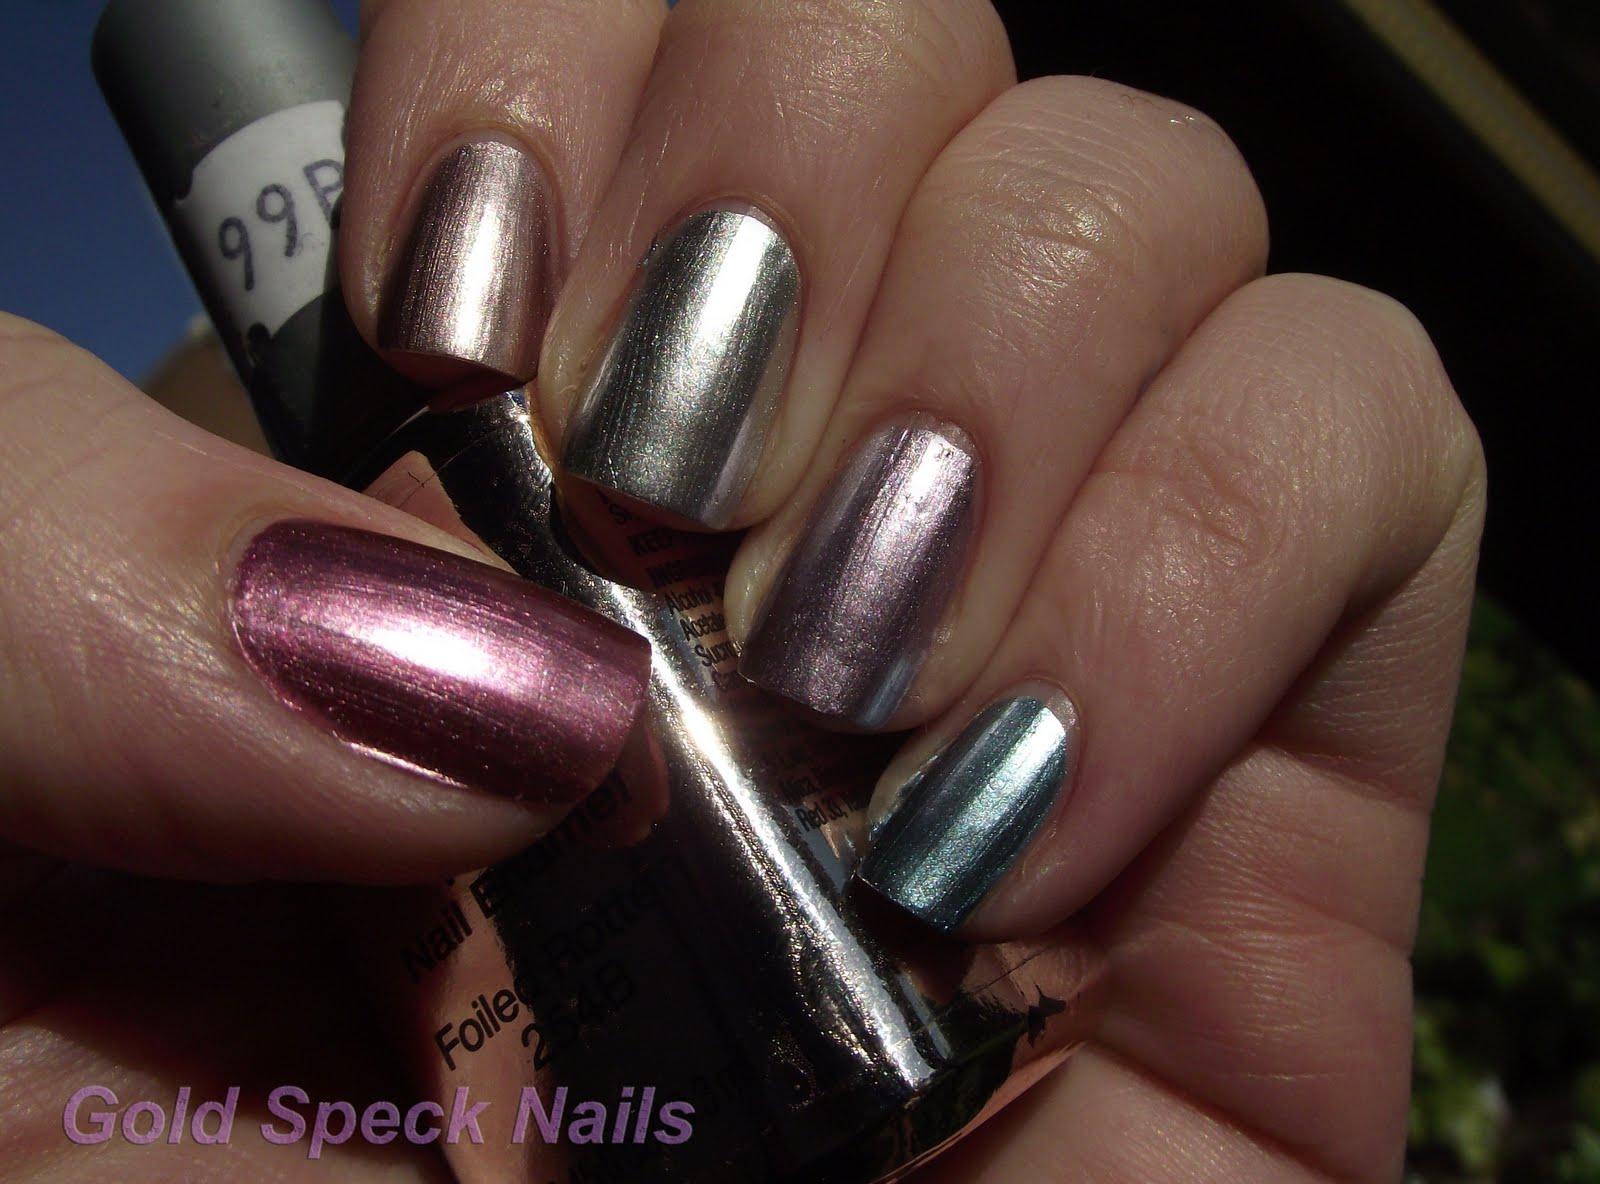 Gold Speck Nails: New Chrome